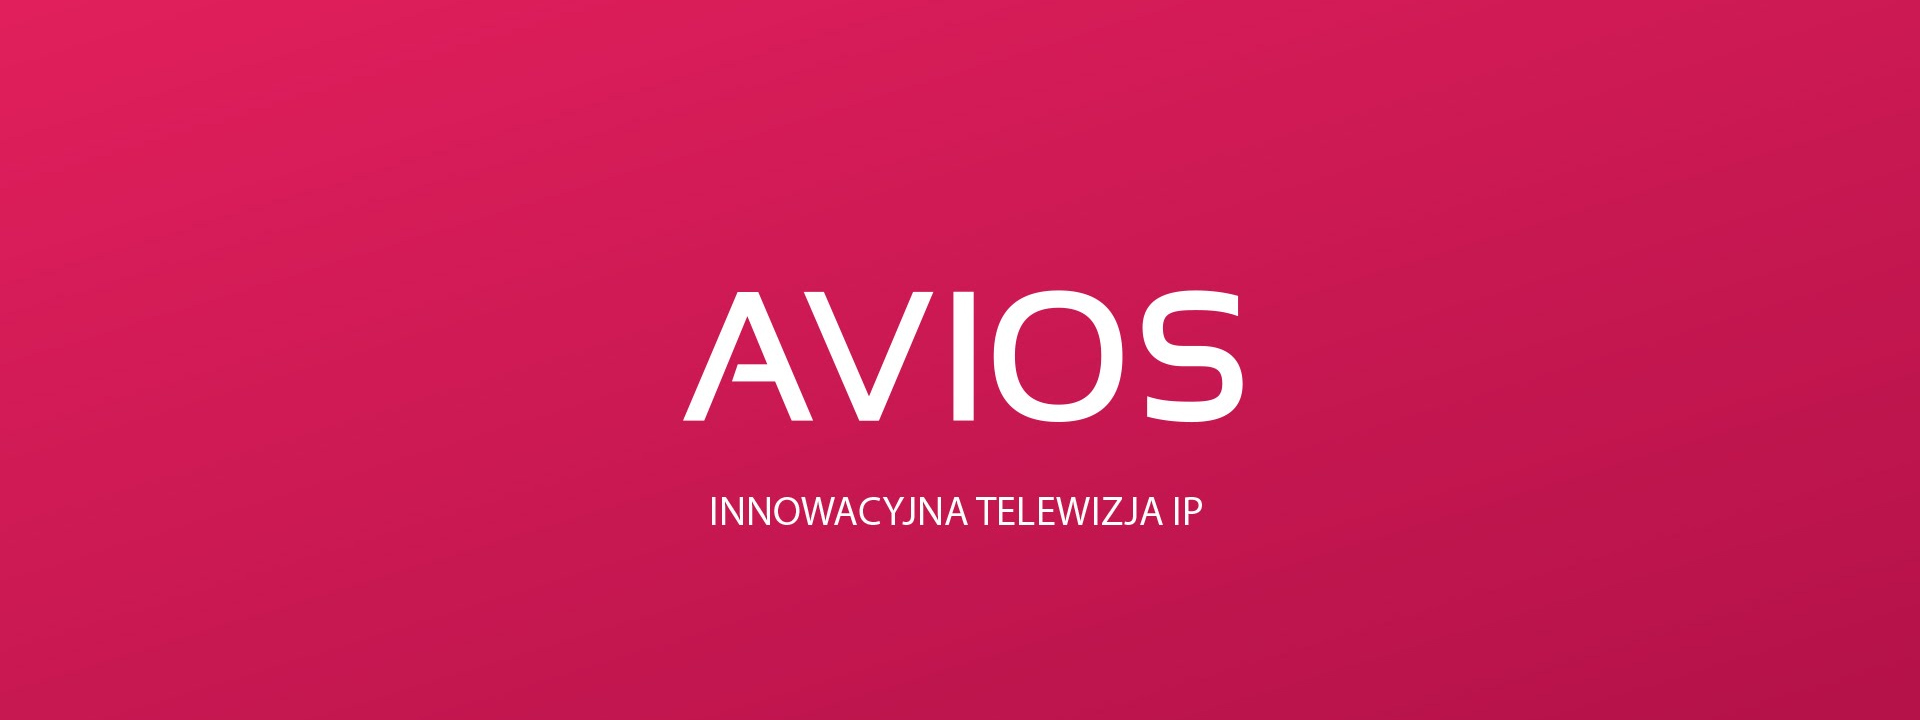 telewizja avios